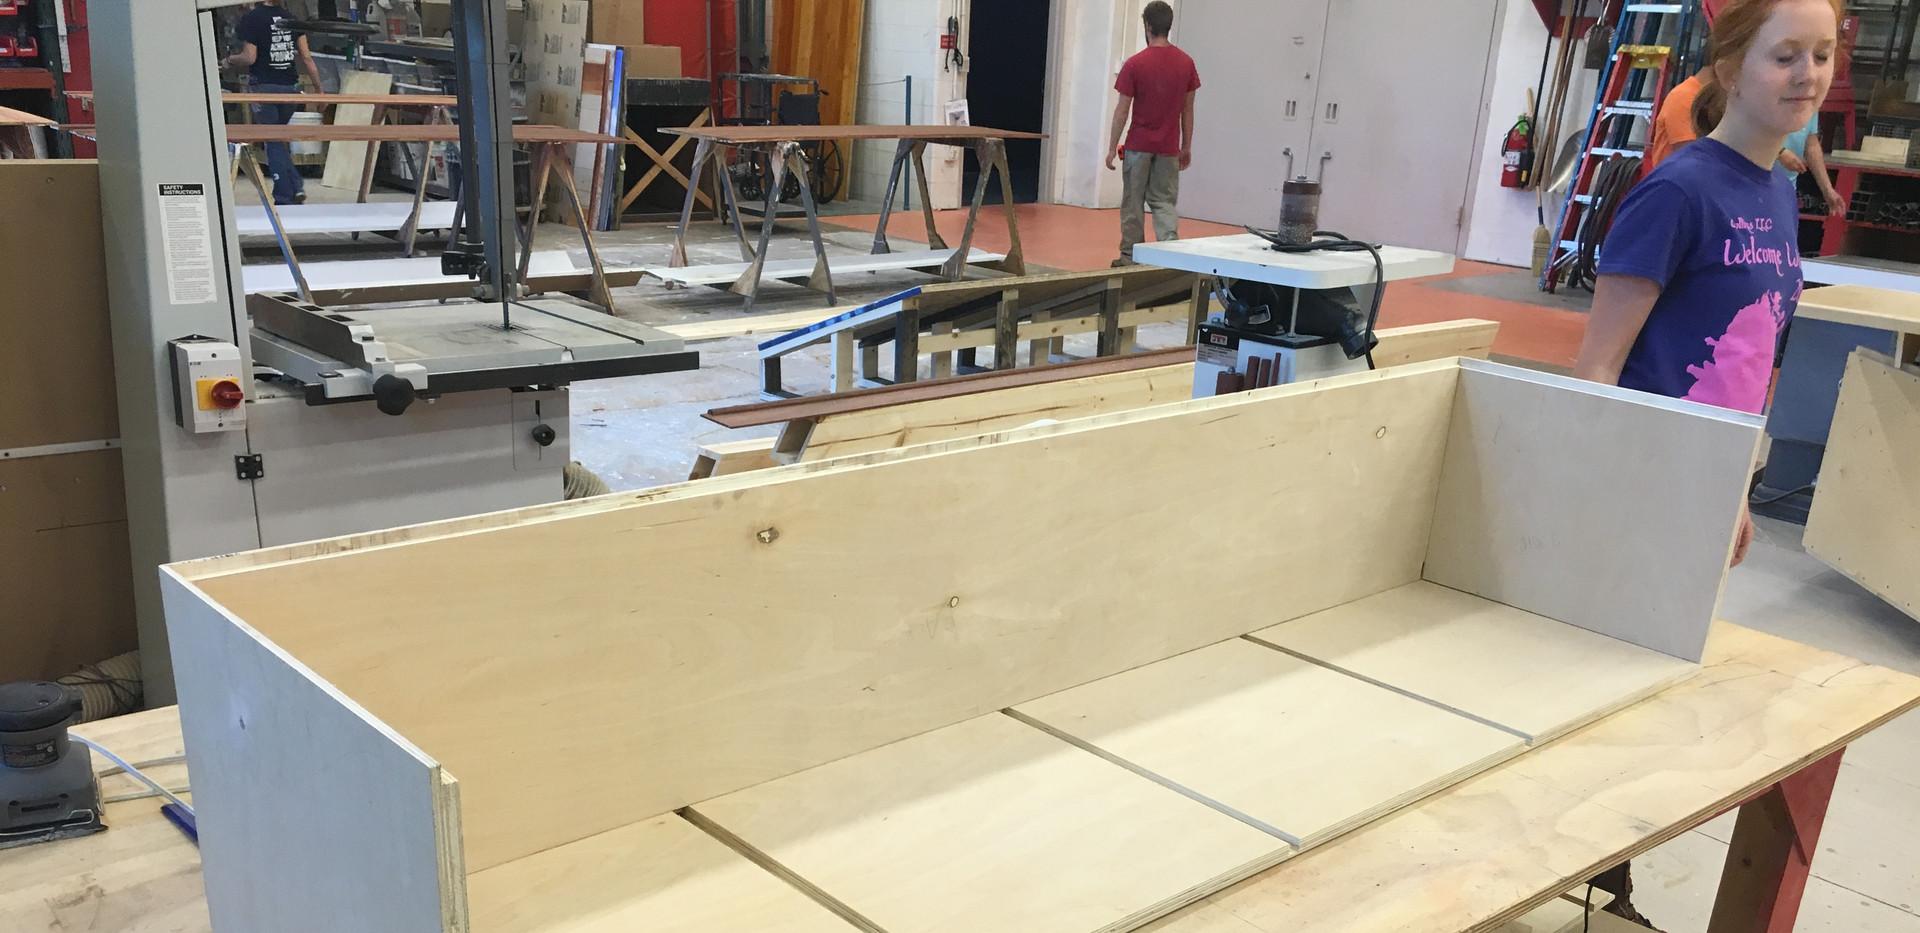 Bench Build